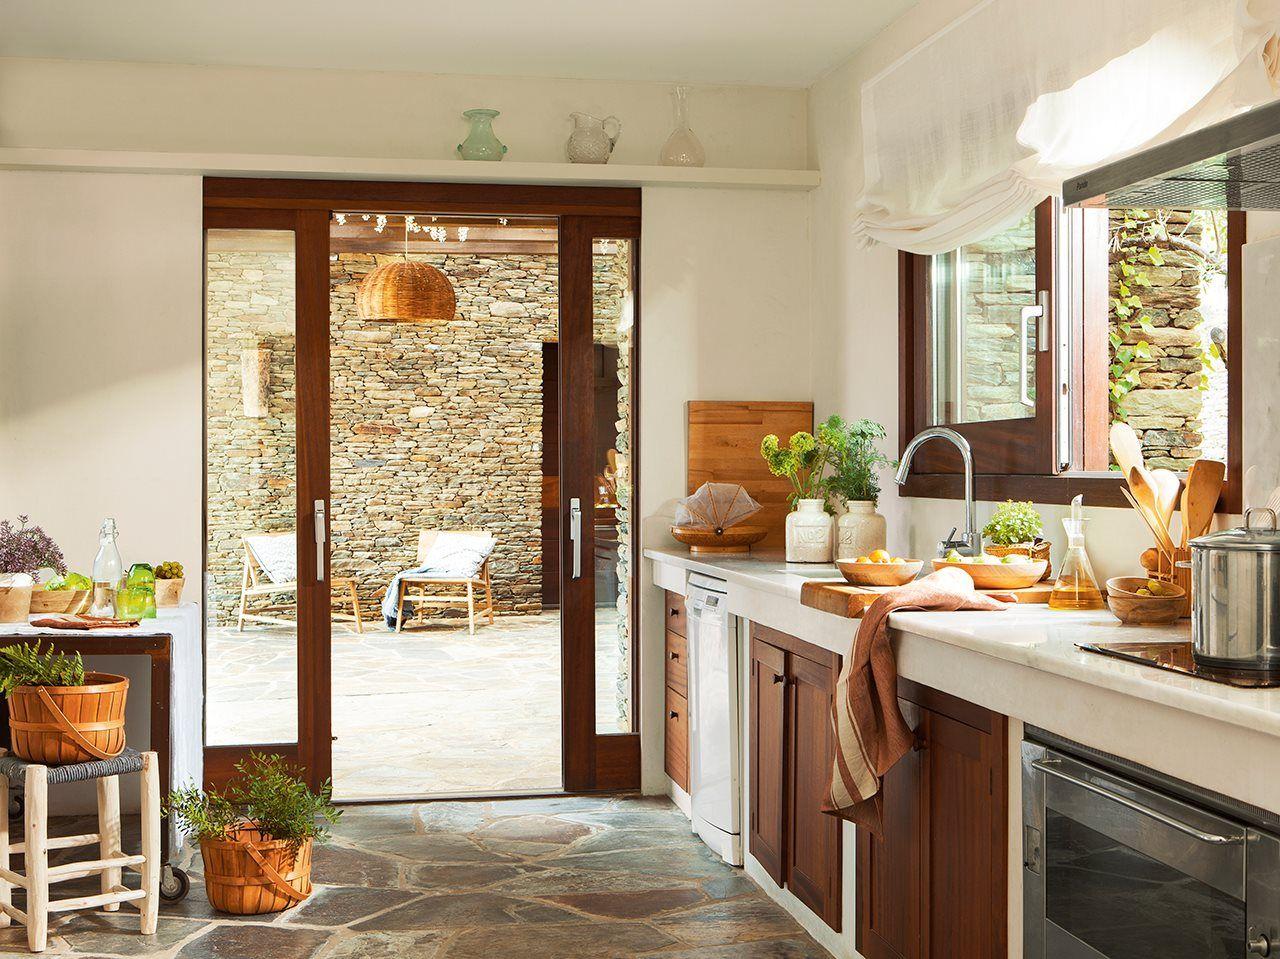 Pin de sophia en lovely kitchen pinterest casas - Cocinas abiertas rusticas ...